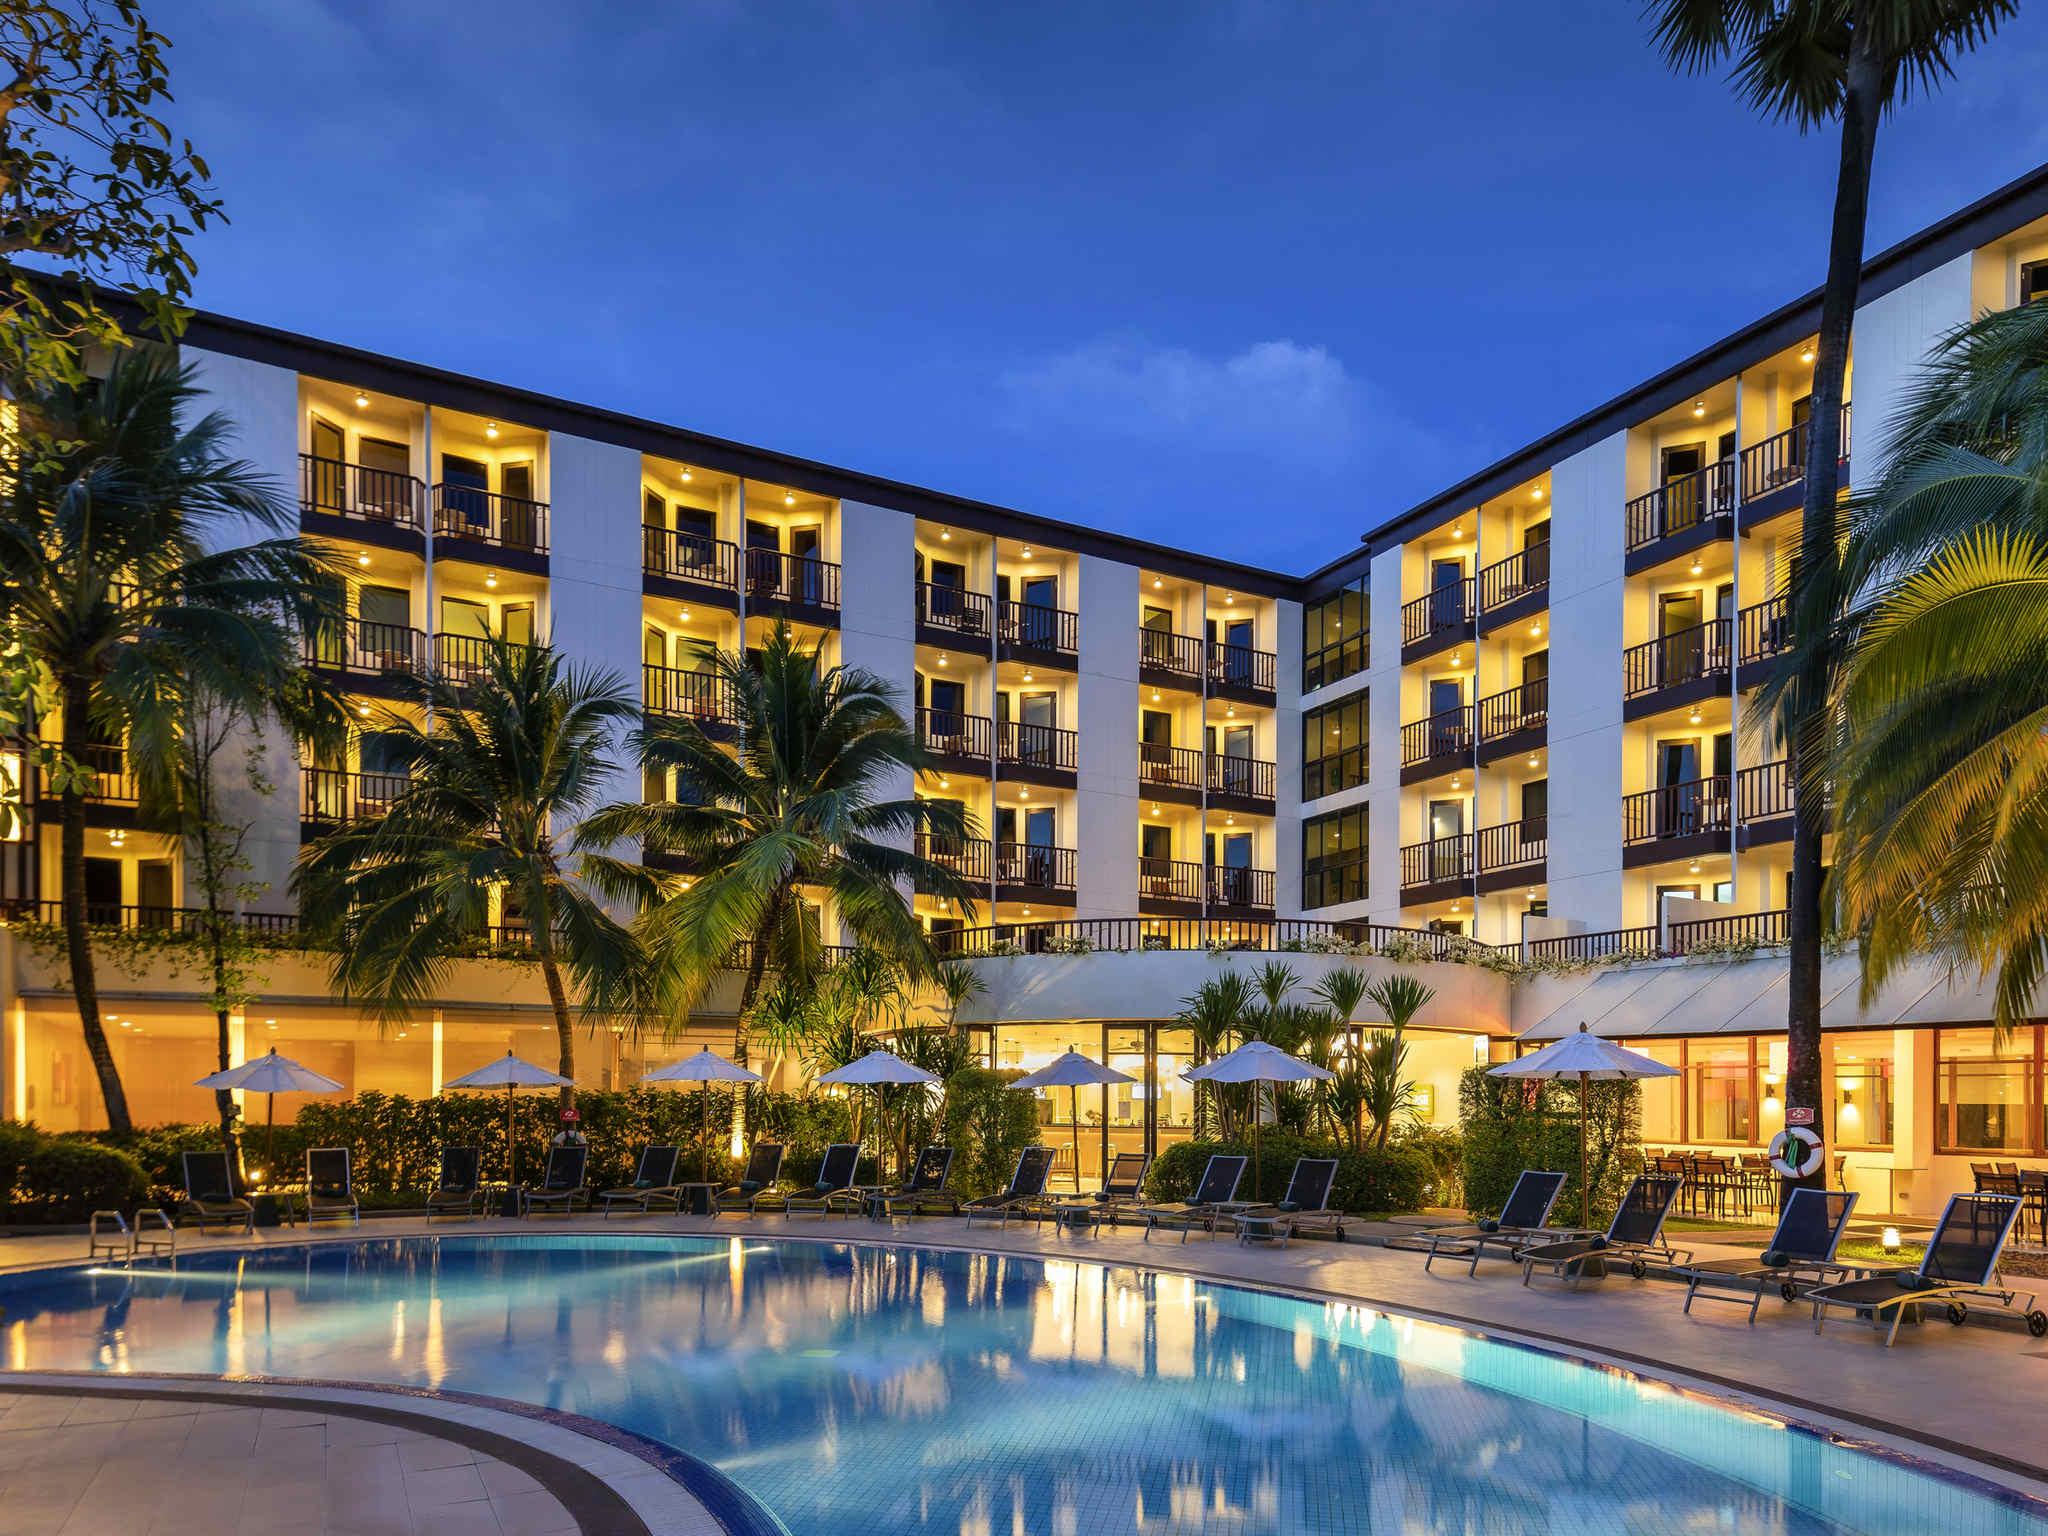 Hotel Ibis Et Patong